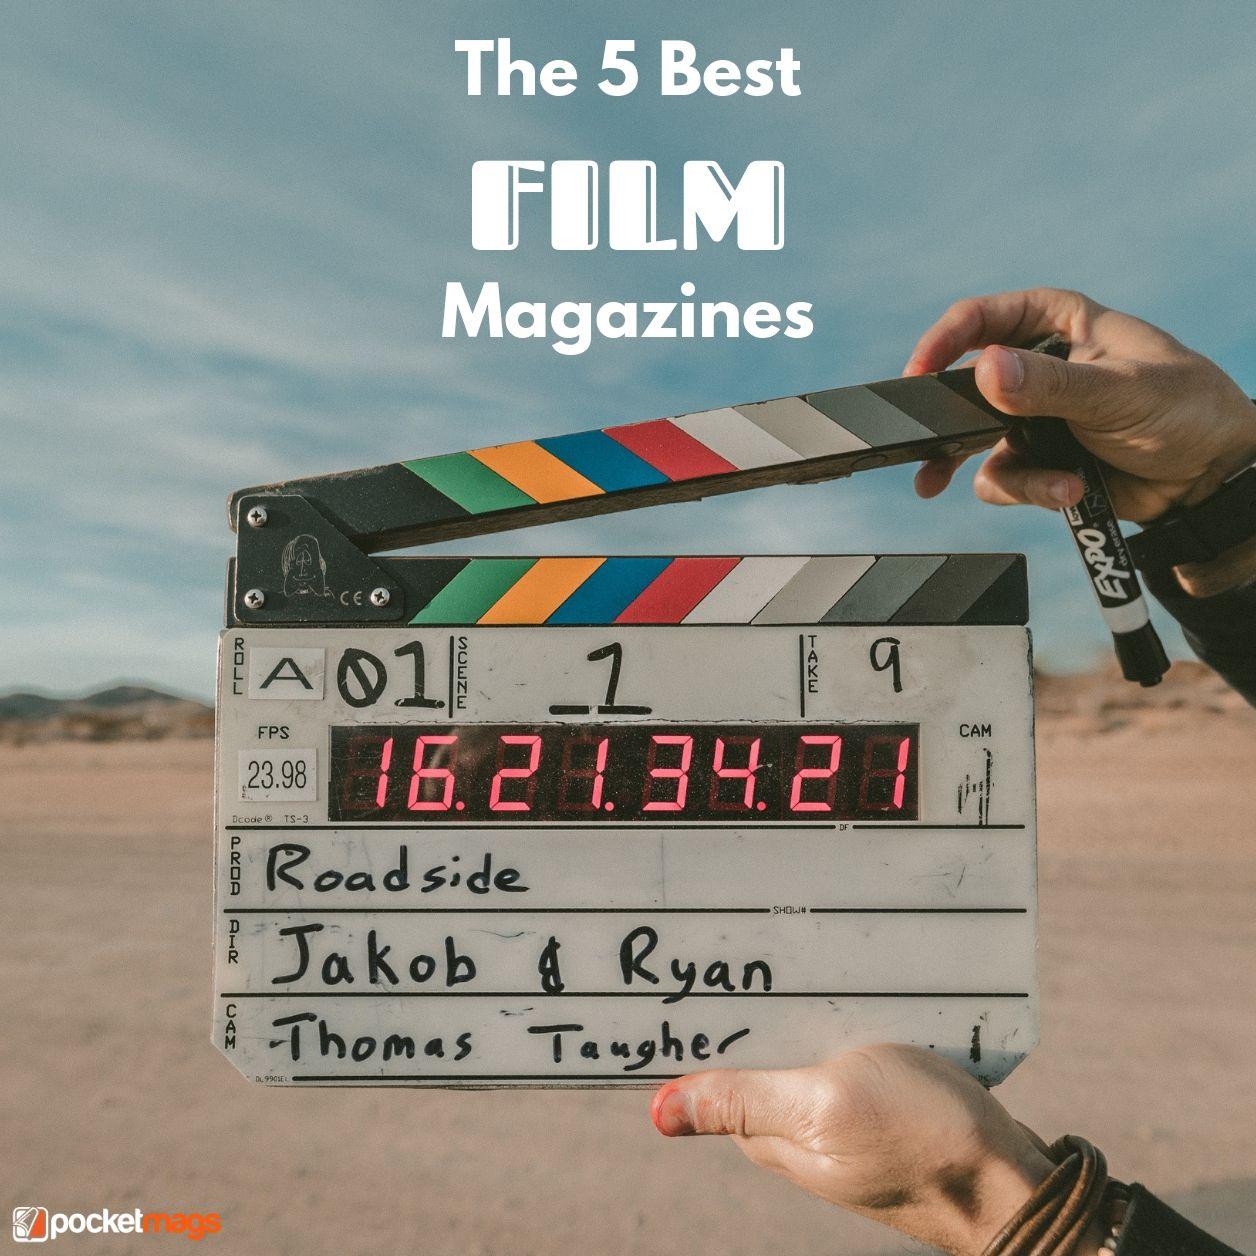 The 5 Best Film Magazines